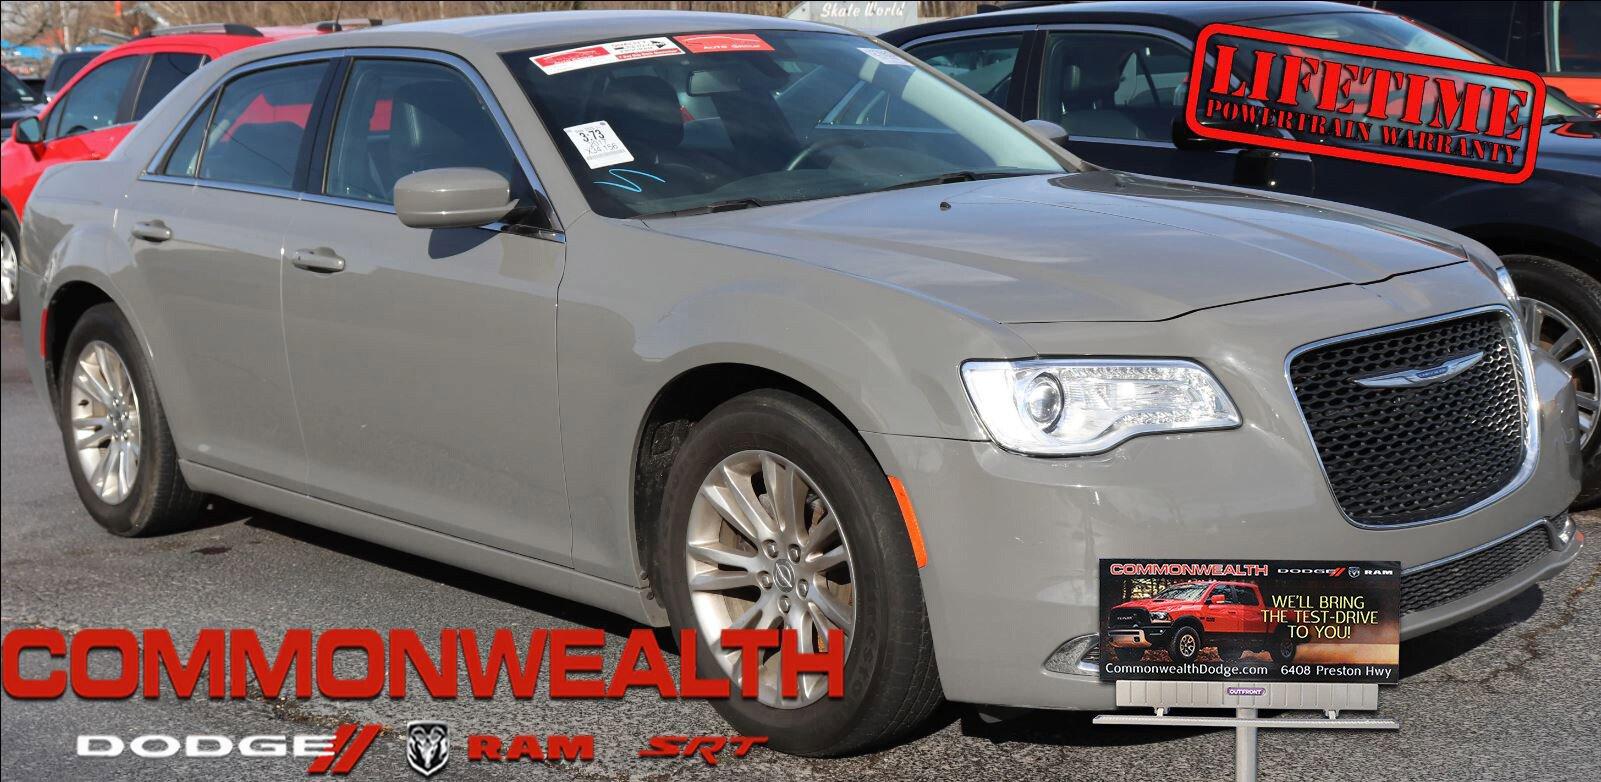 2017 Chrysler 300 Limited image